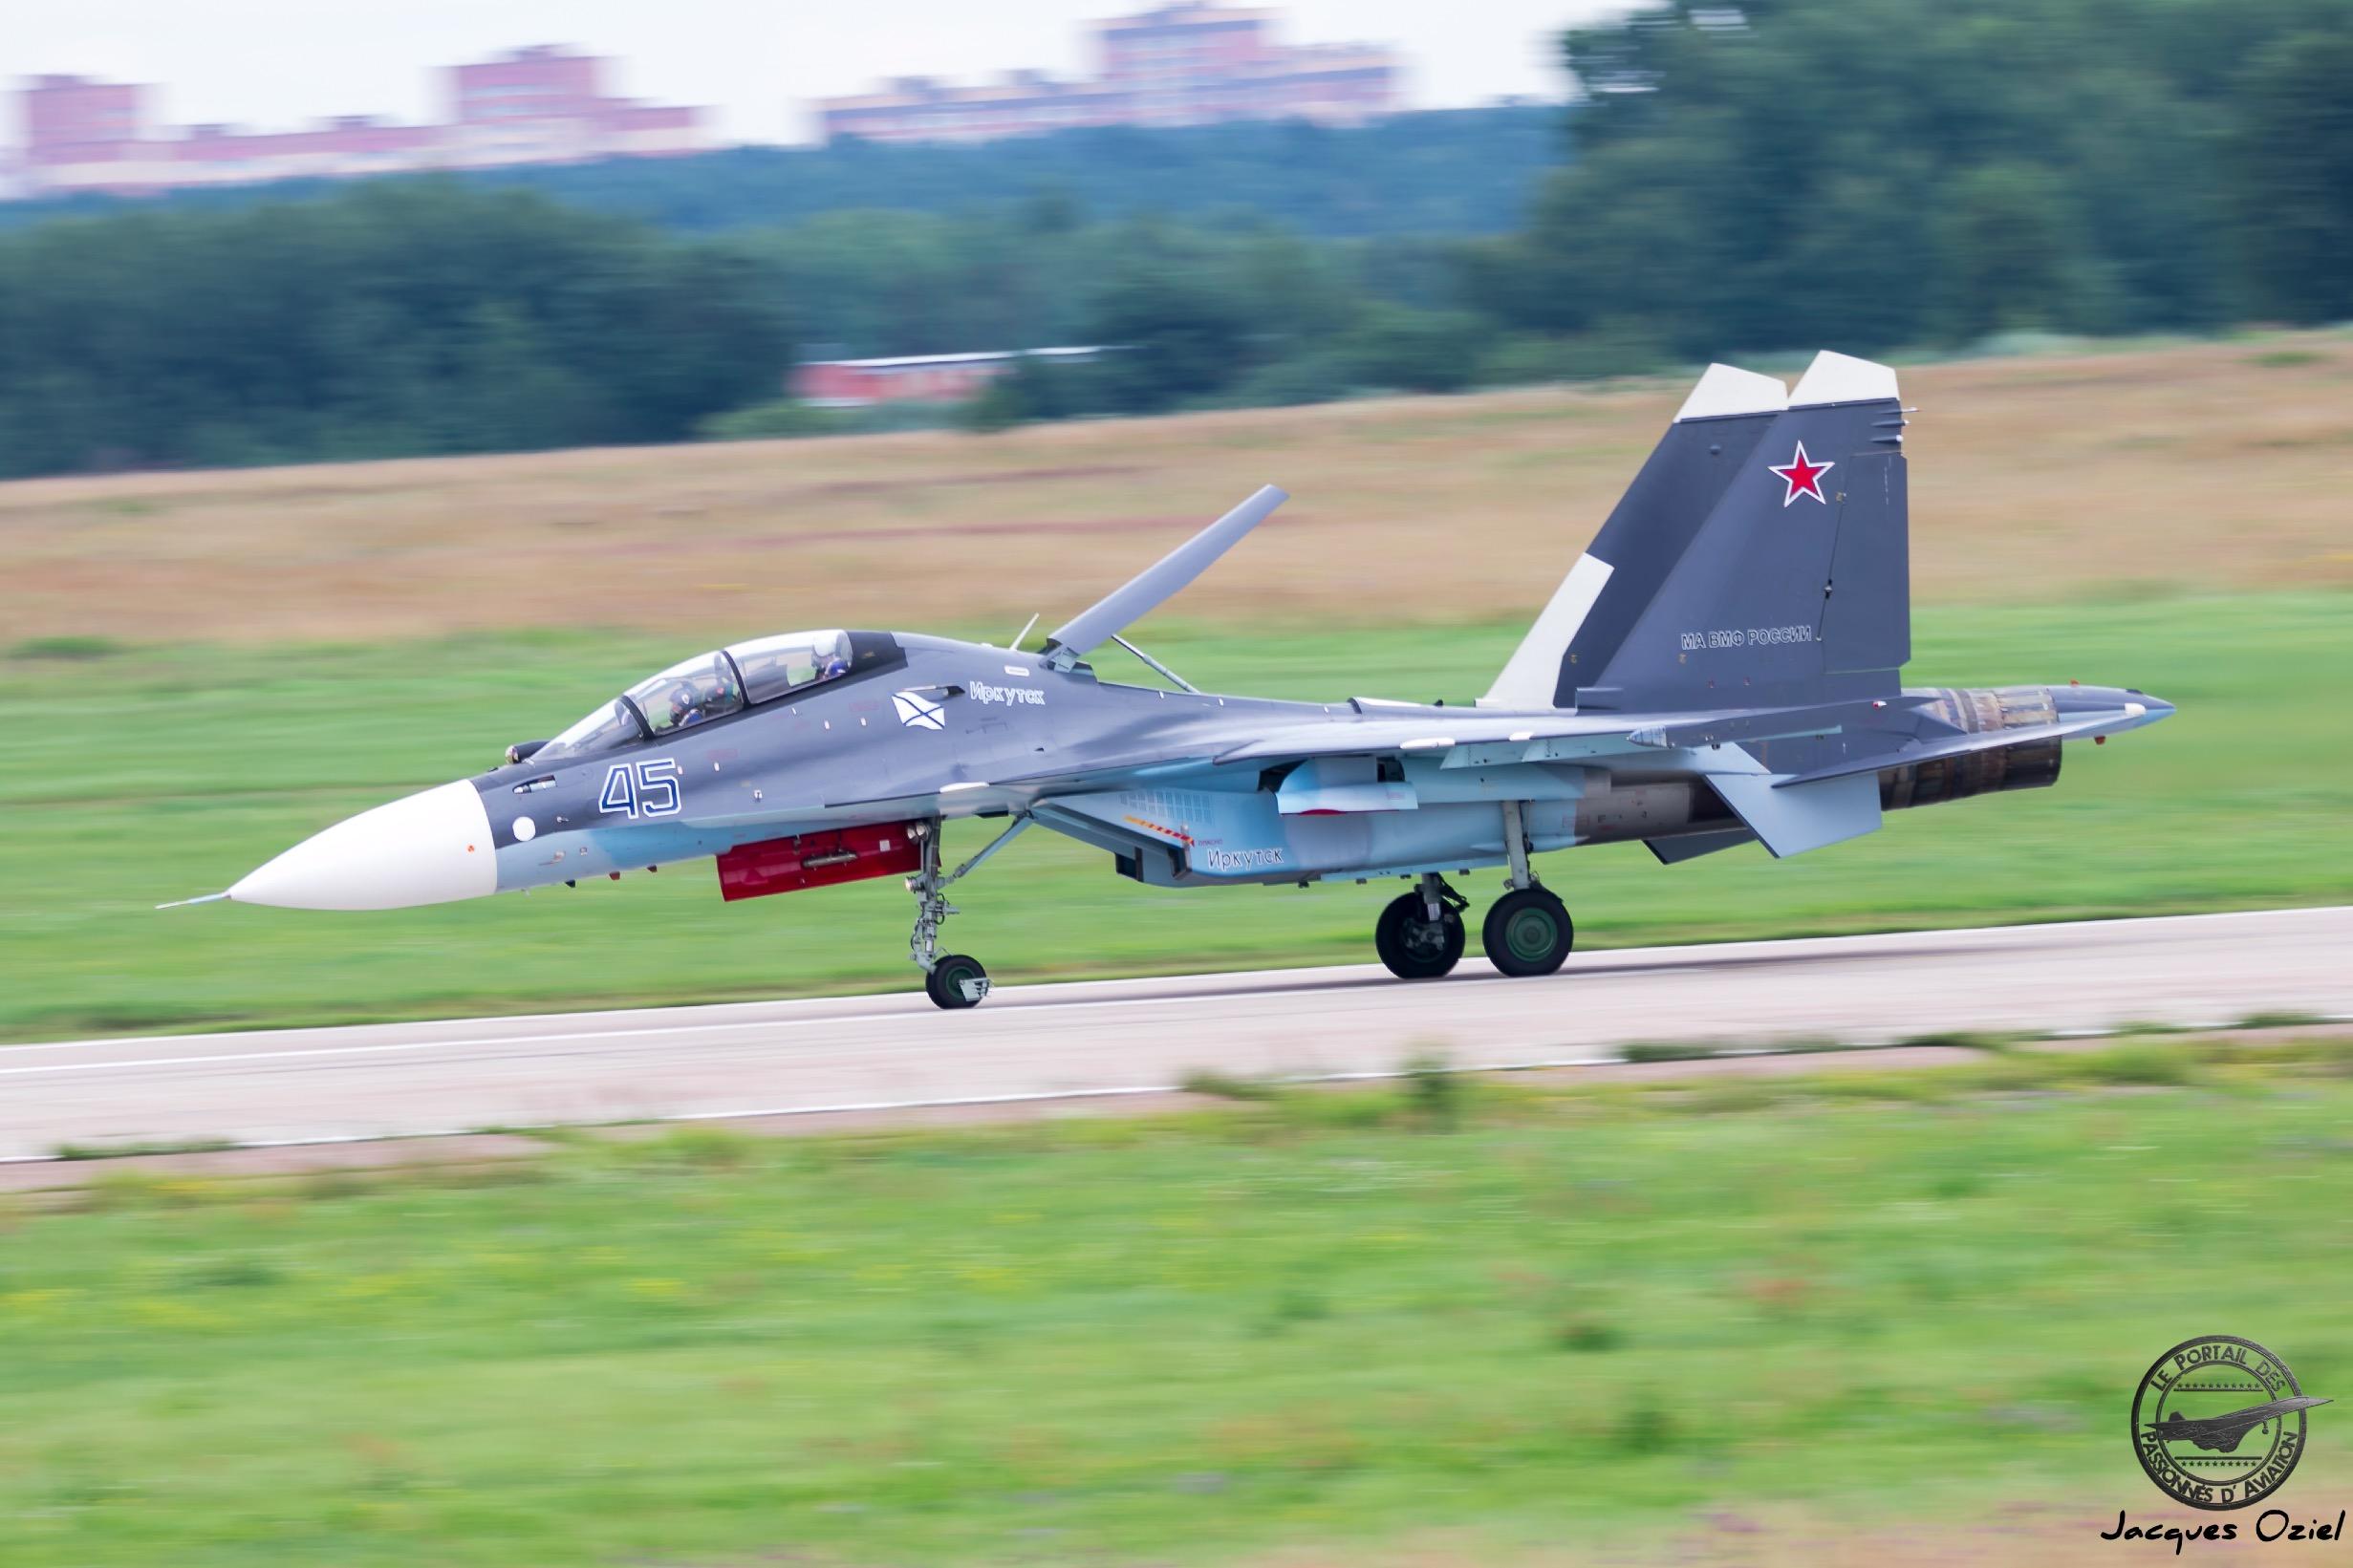 Sukhoi Su-30SM 45 bleu de l'Aviation Navale